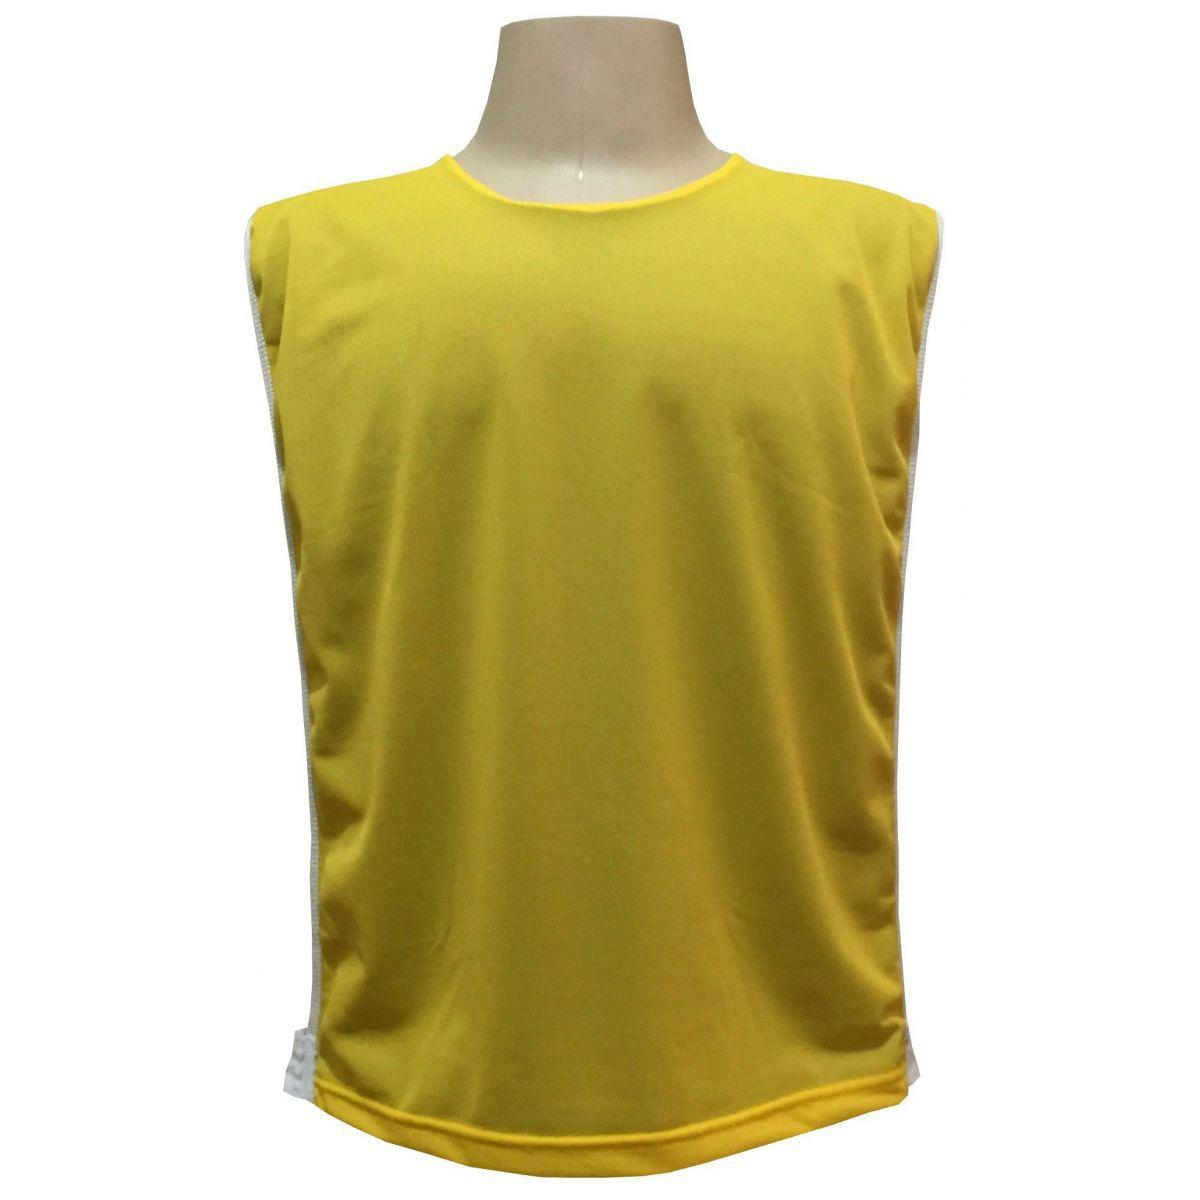 Jogo de Coletes Dupla Face 15 Unidades na cor Amarelo Royal - Kanga sport  R  267 b183ad1a37d66